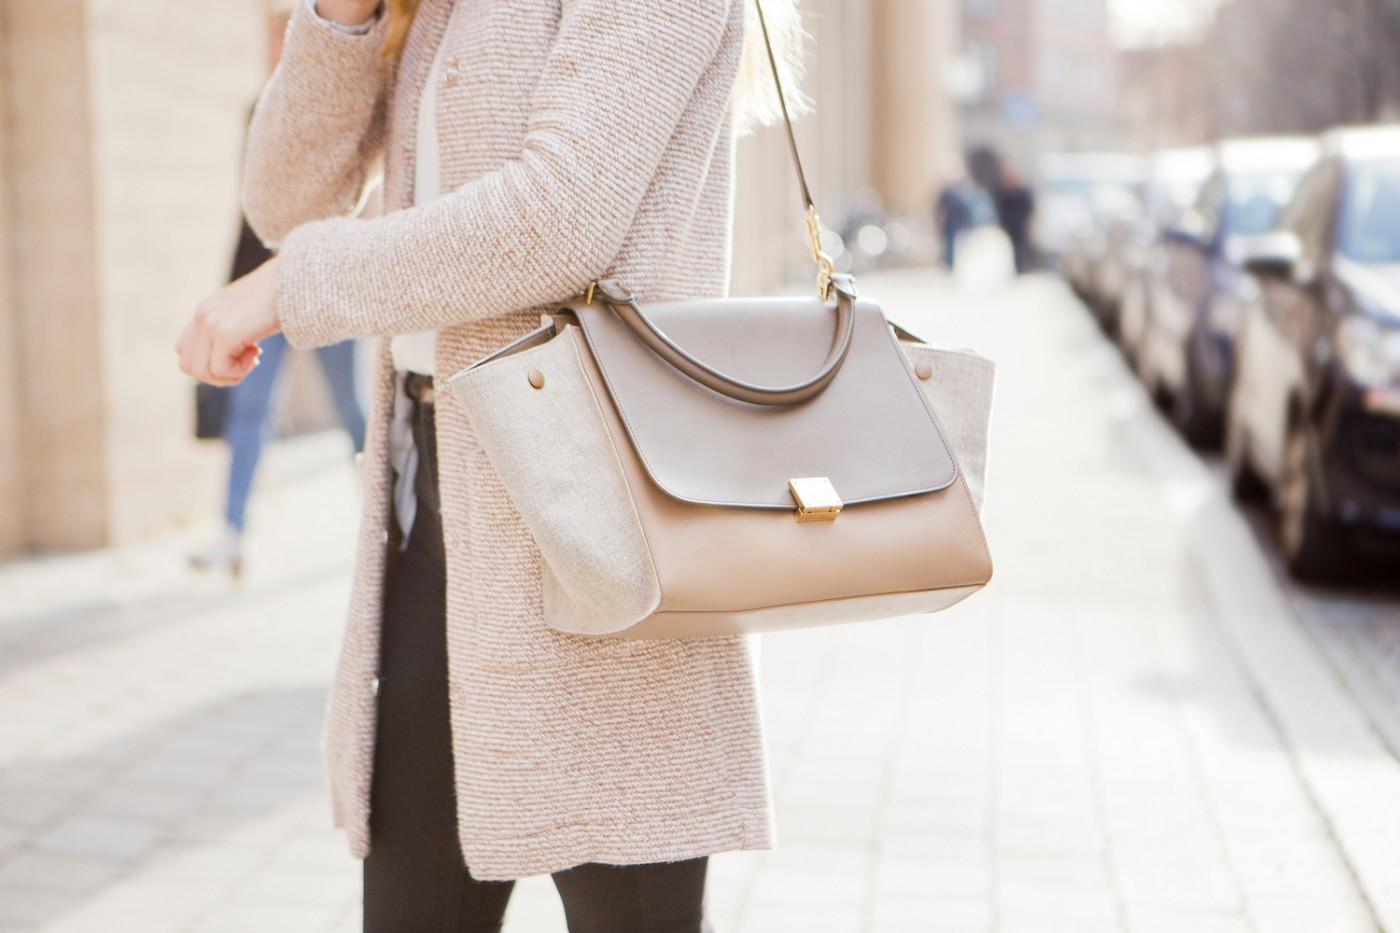 comfortable weekday look, Céline Trapeze Bag, Cozy knit wear look, The Golden Bun   München Modeblog, German Fashion Blog, Fashionblogger, new trends